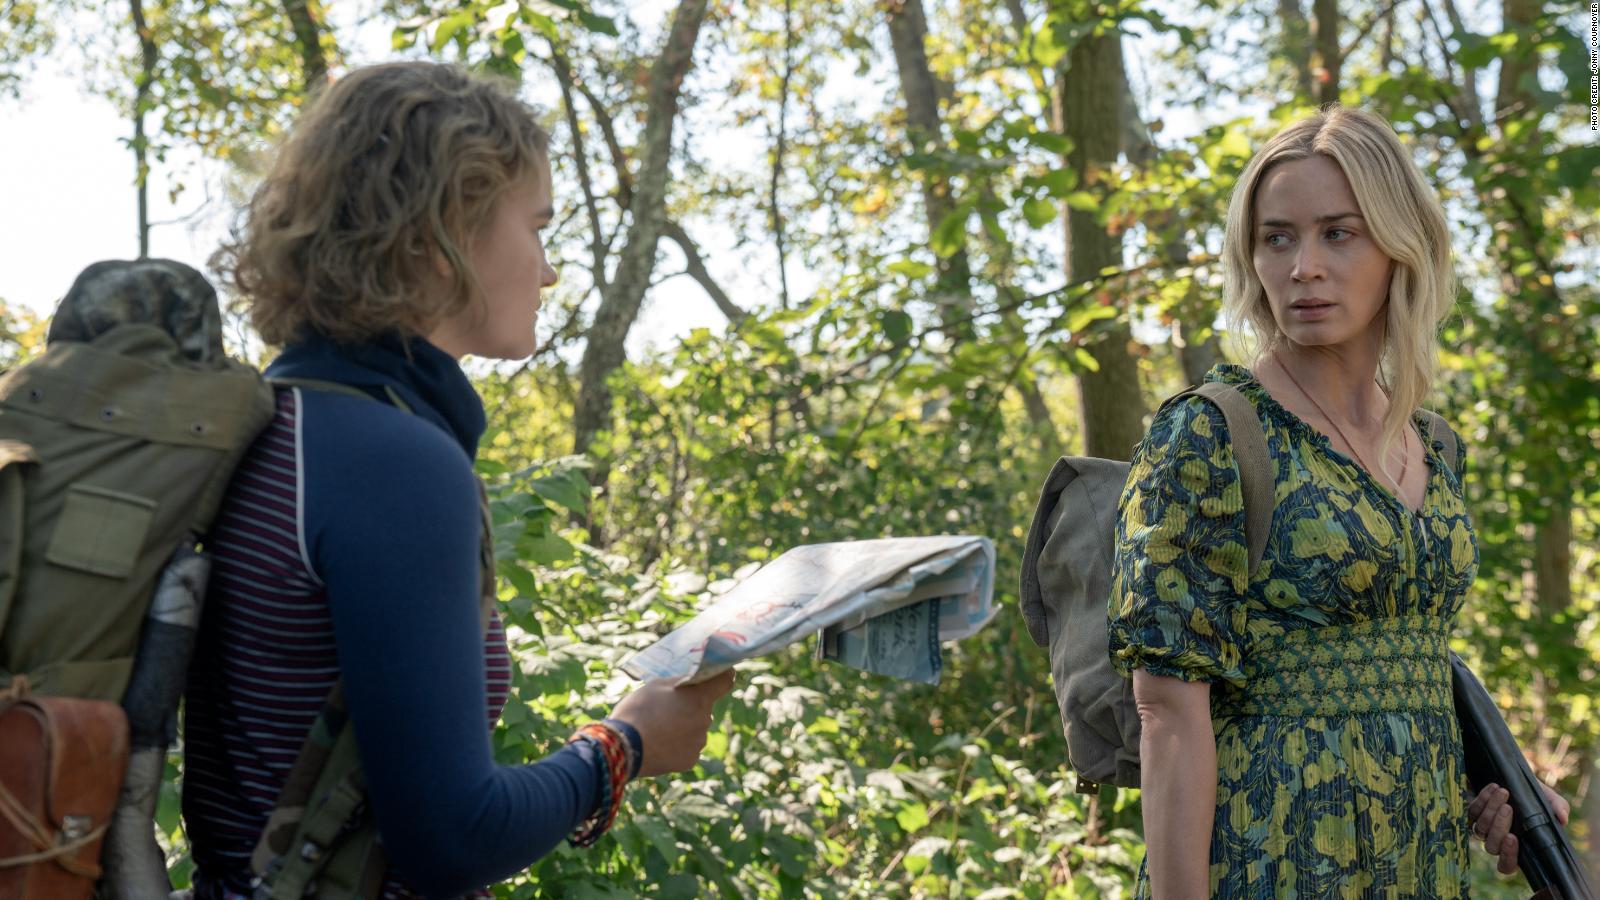 A Quiet Place Part II' review: John Krasinski's sequel takes a bigger step  into the world beyond the original - CNN